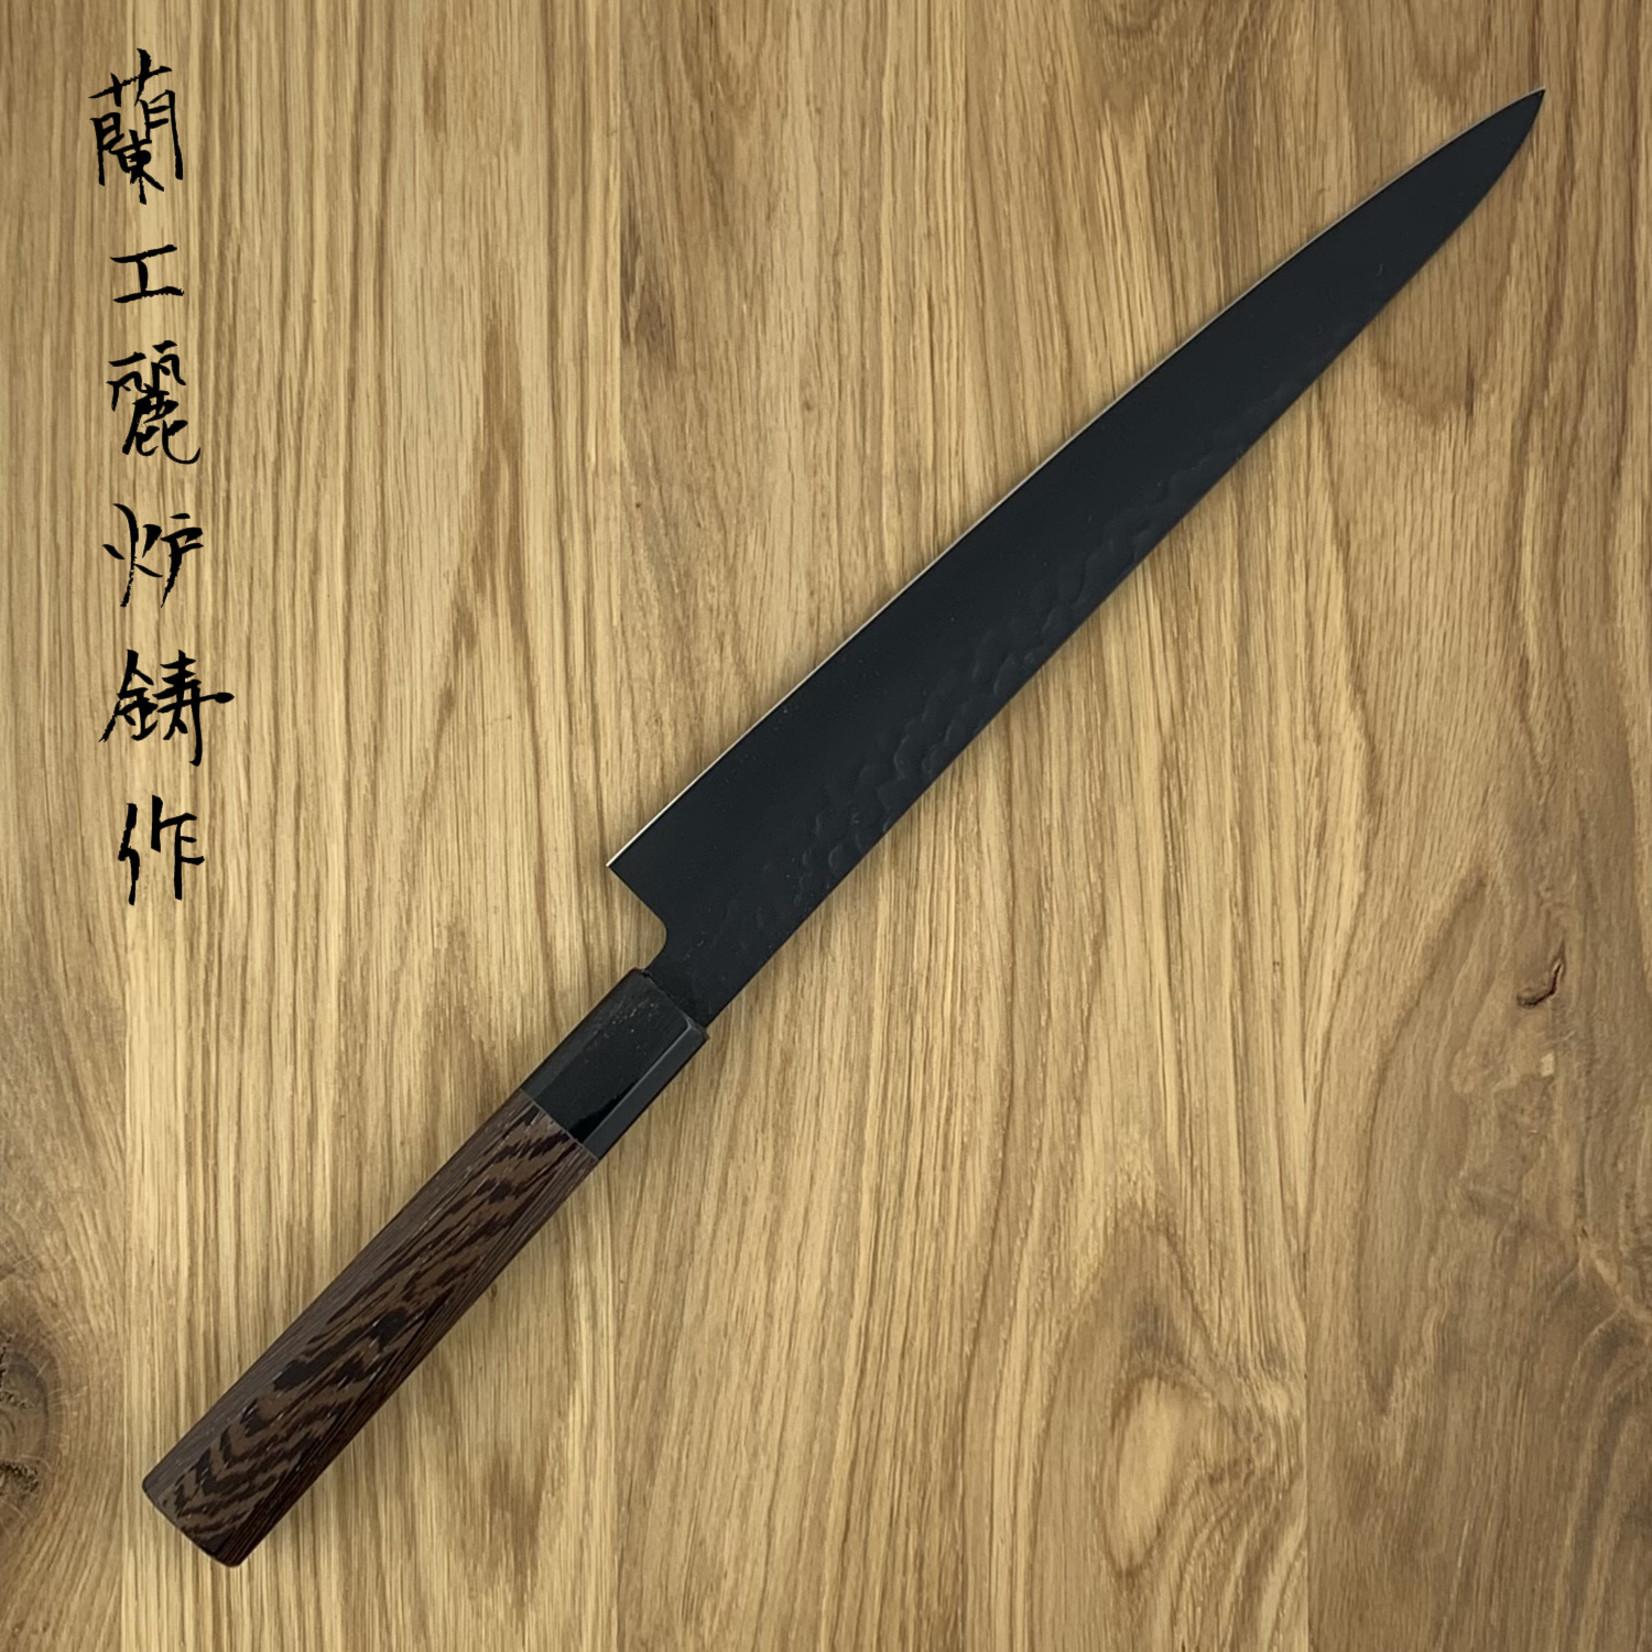 SAKAI TAKAYUKI  Kurokage Sujihiki  240 mm 07497